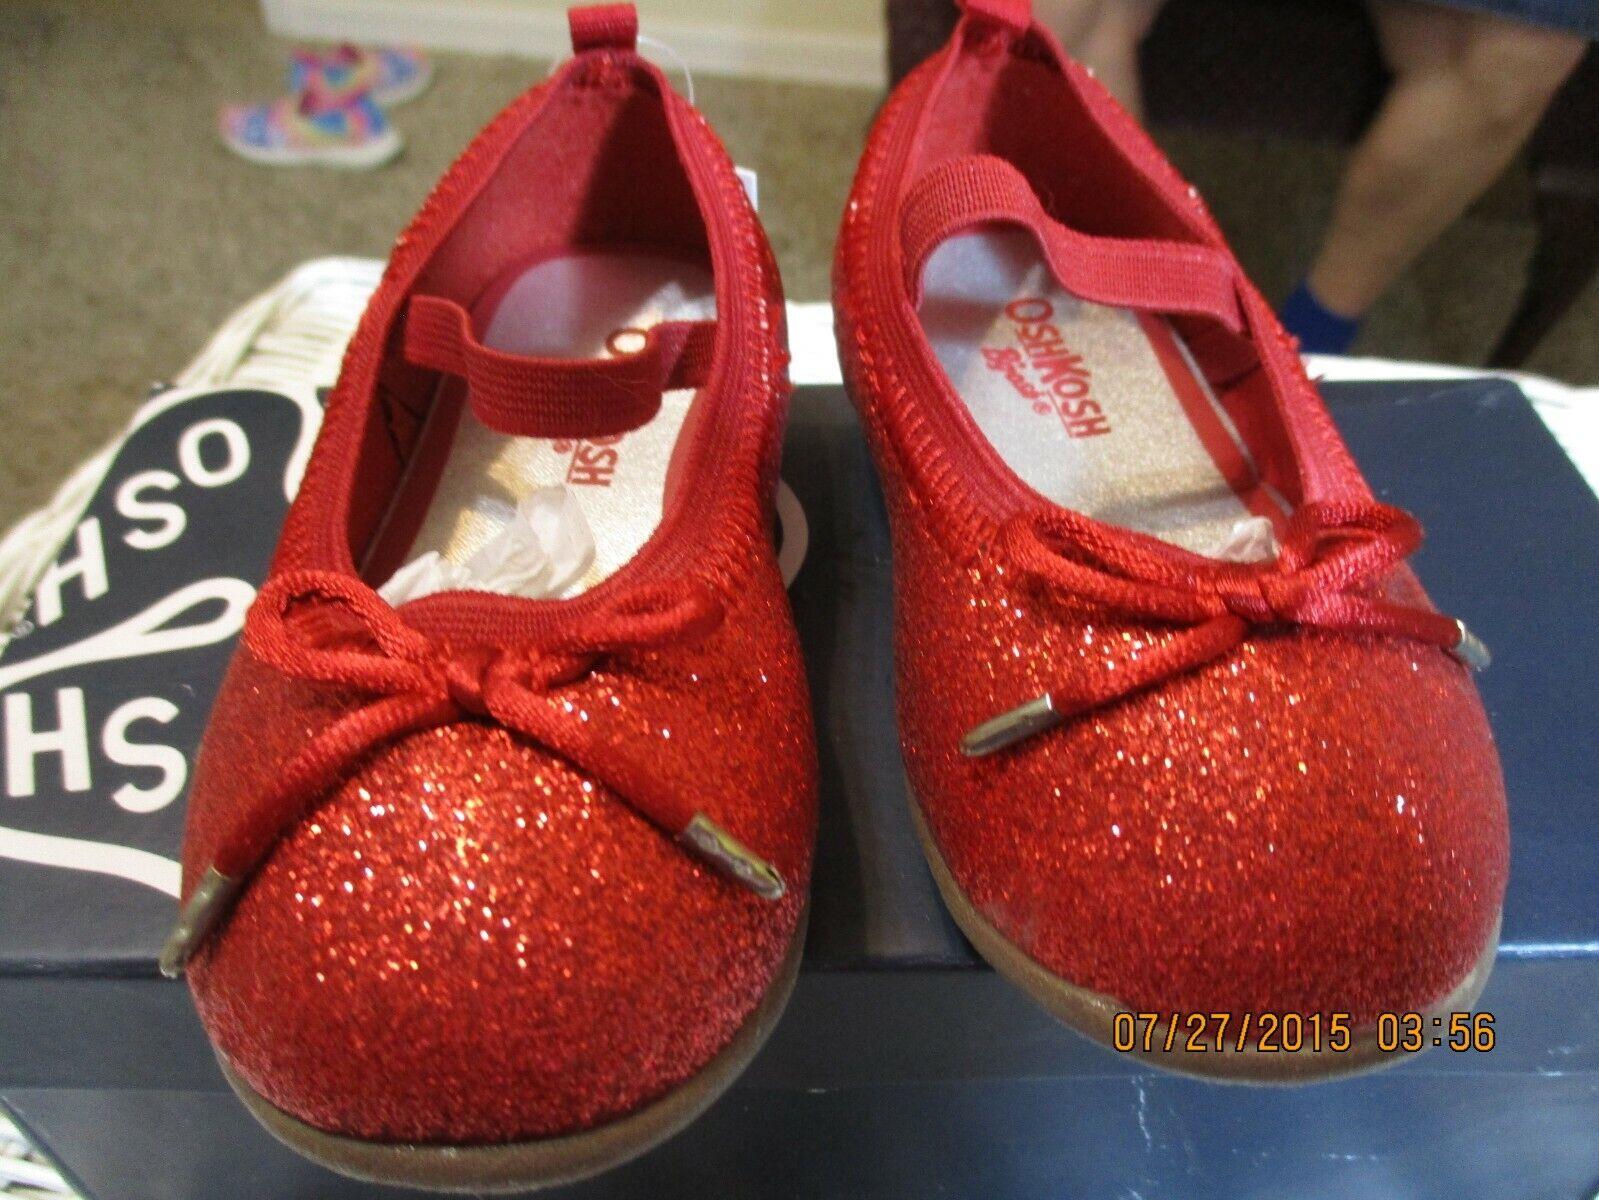 NWT OSHKOSH B GOSH SIZE 5 LITTLE GIRLS SHOES-RED SPARKLY- - $20.00